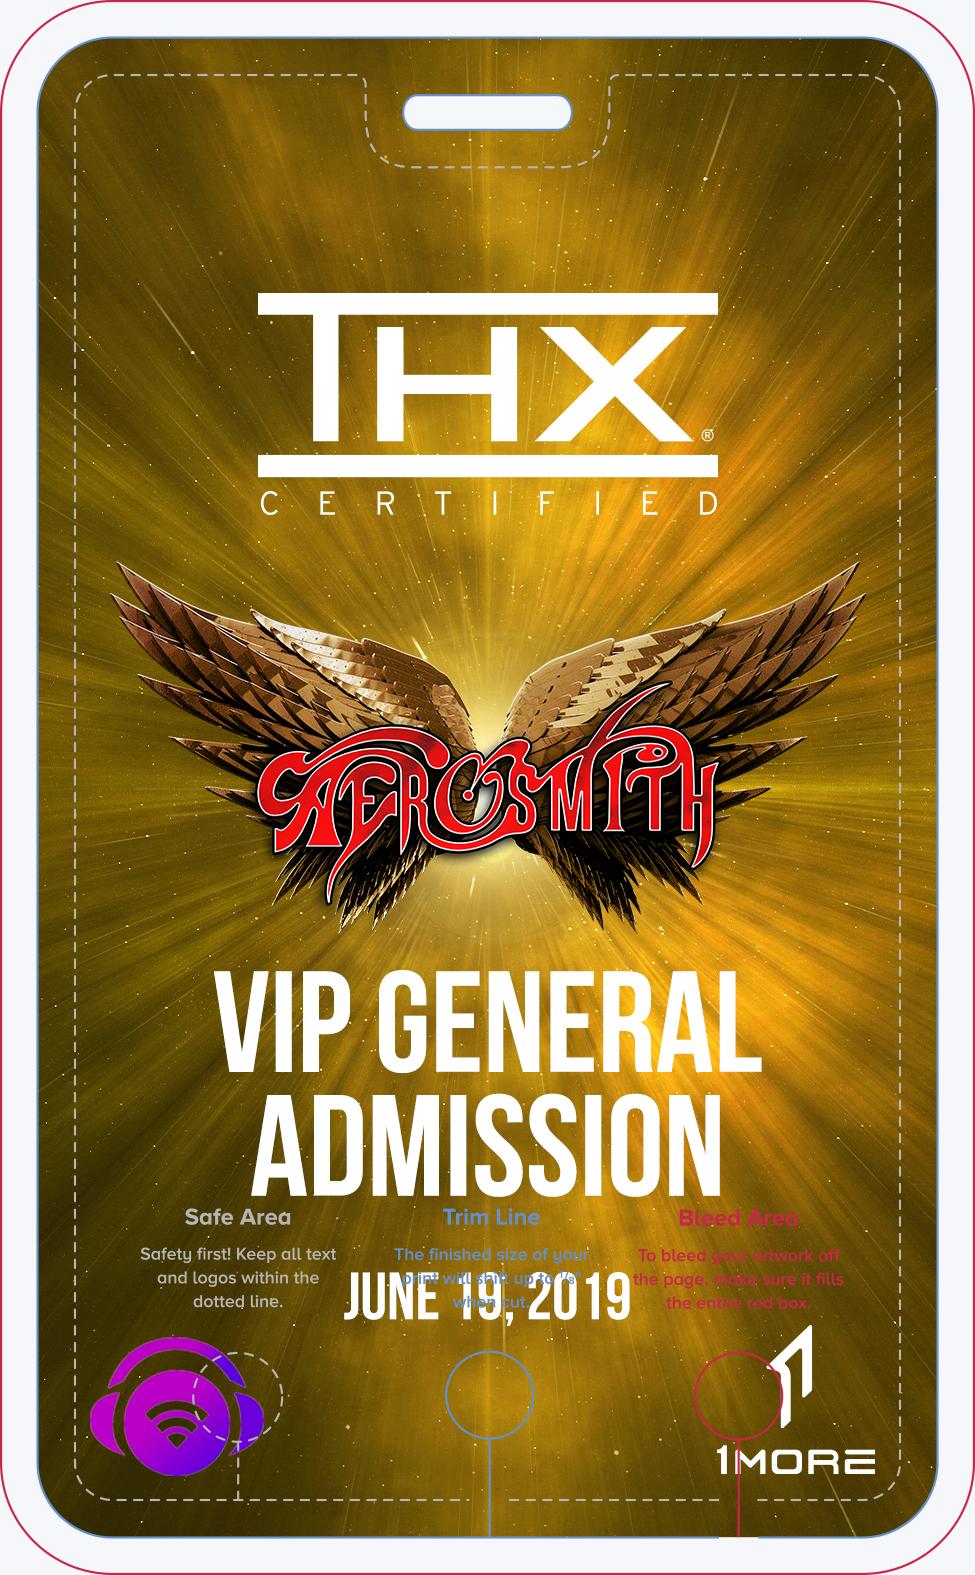 Aerosmith VIP General Admission Gold Badge.jpg